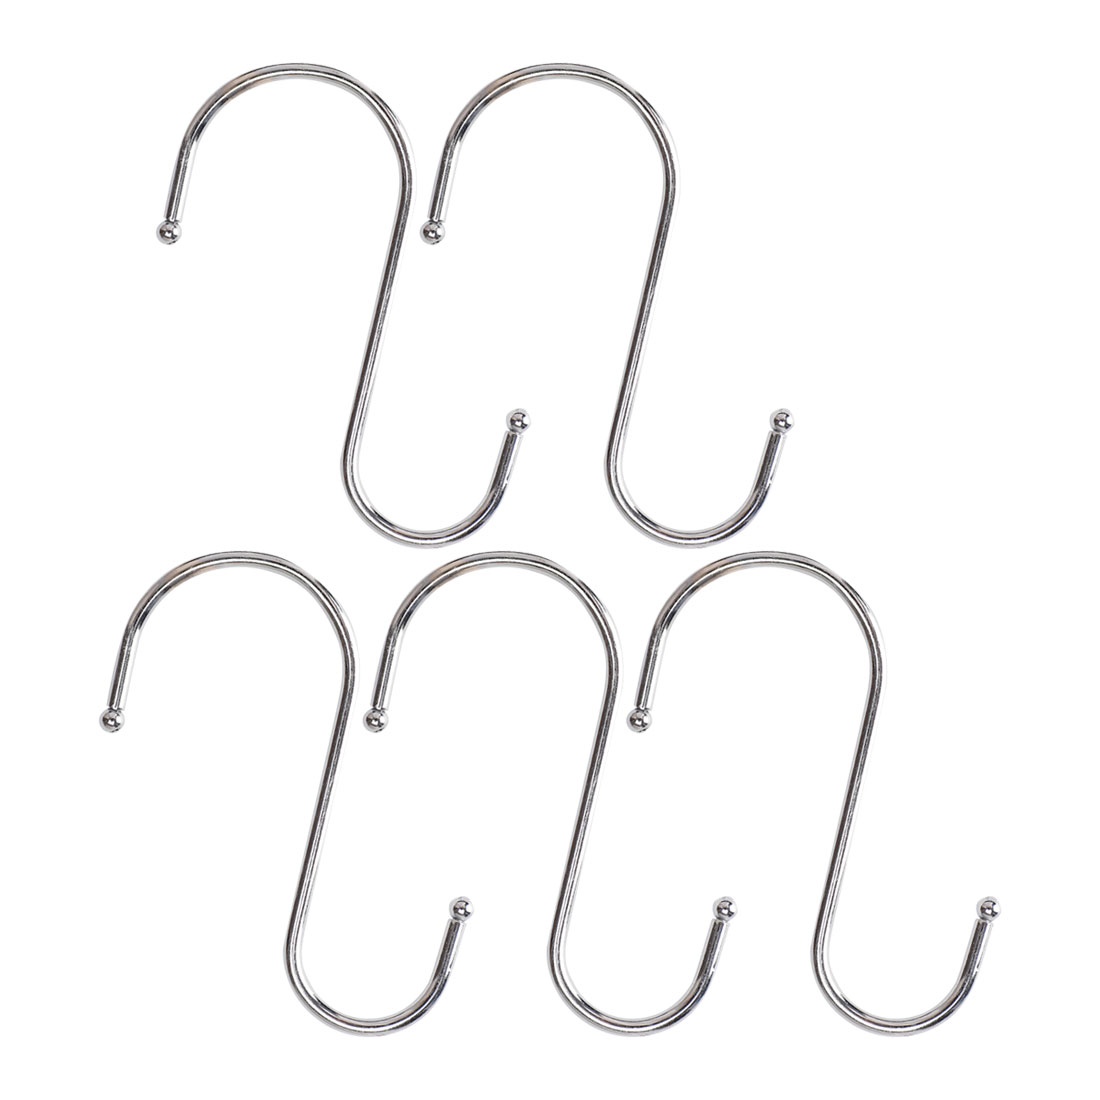 Stainless Steel S Shaped Kitchen Pot Pan Clothes Hanger Hook 9.5cm Long 5 PCS